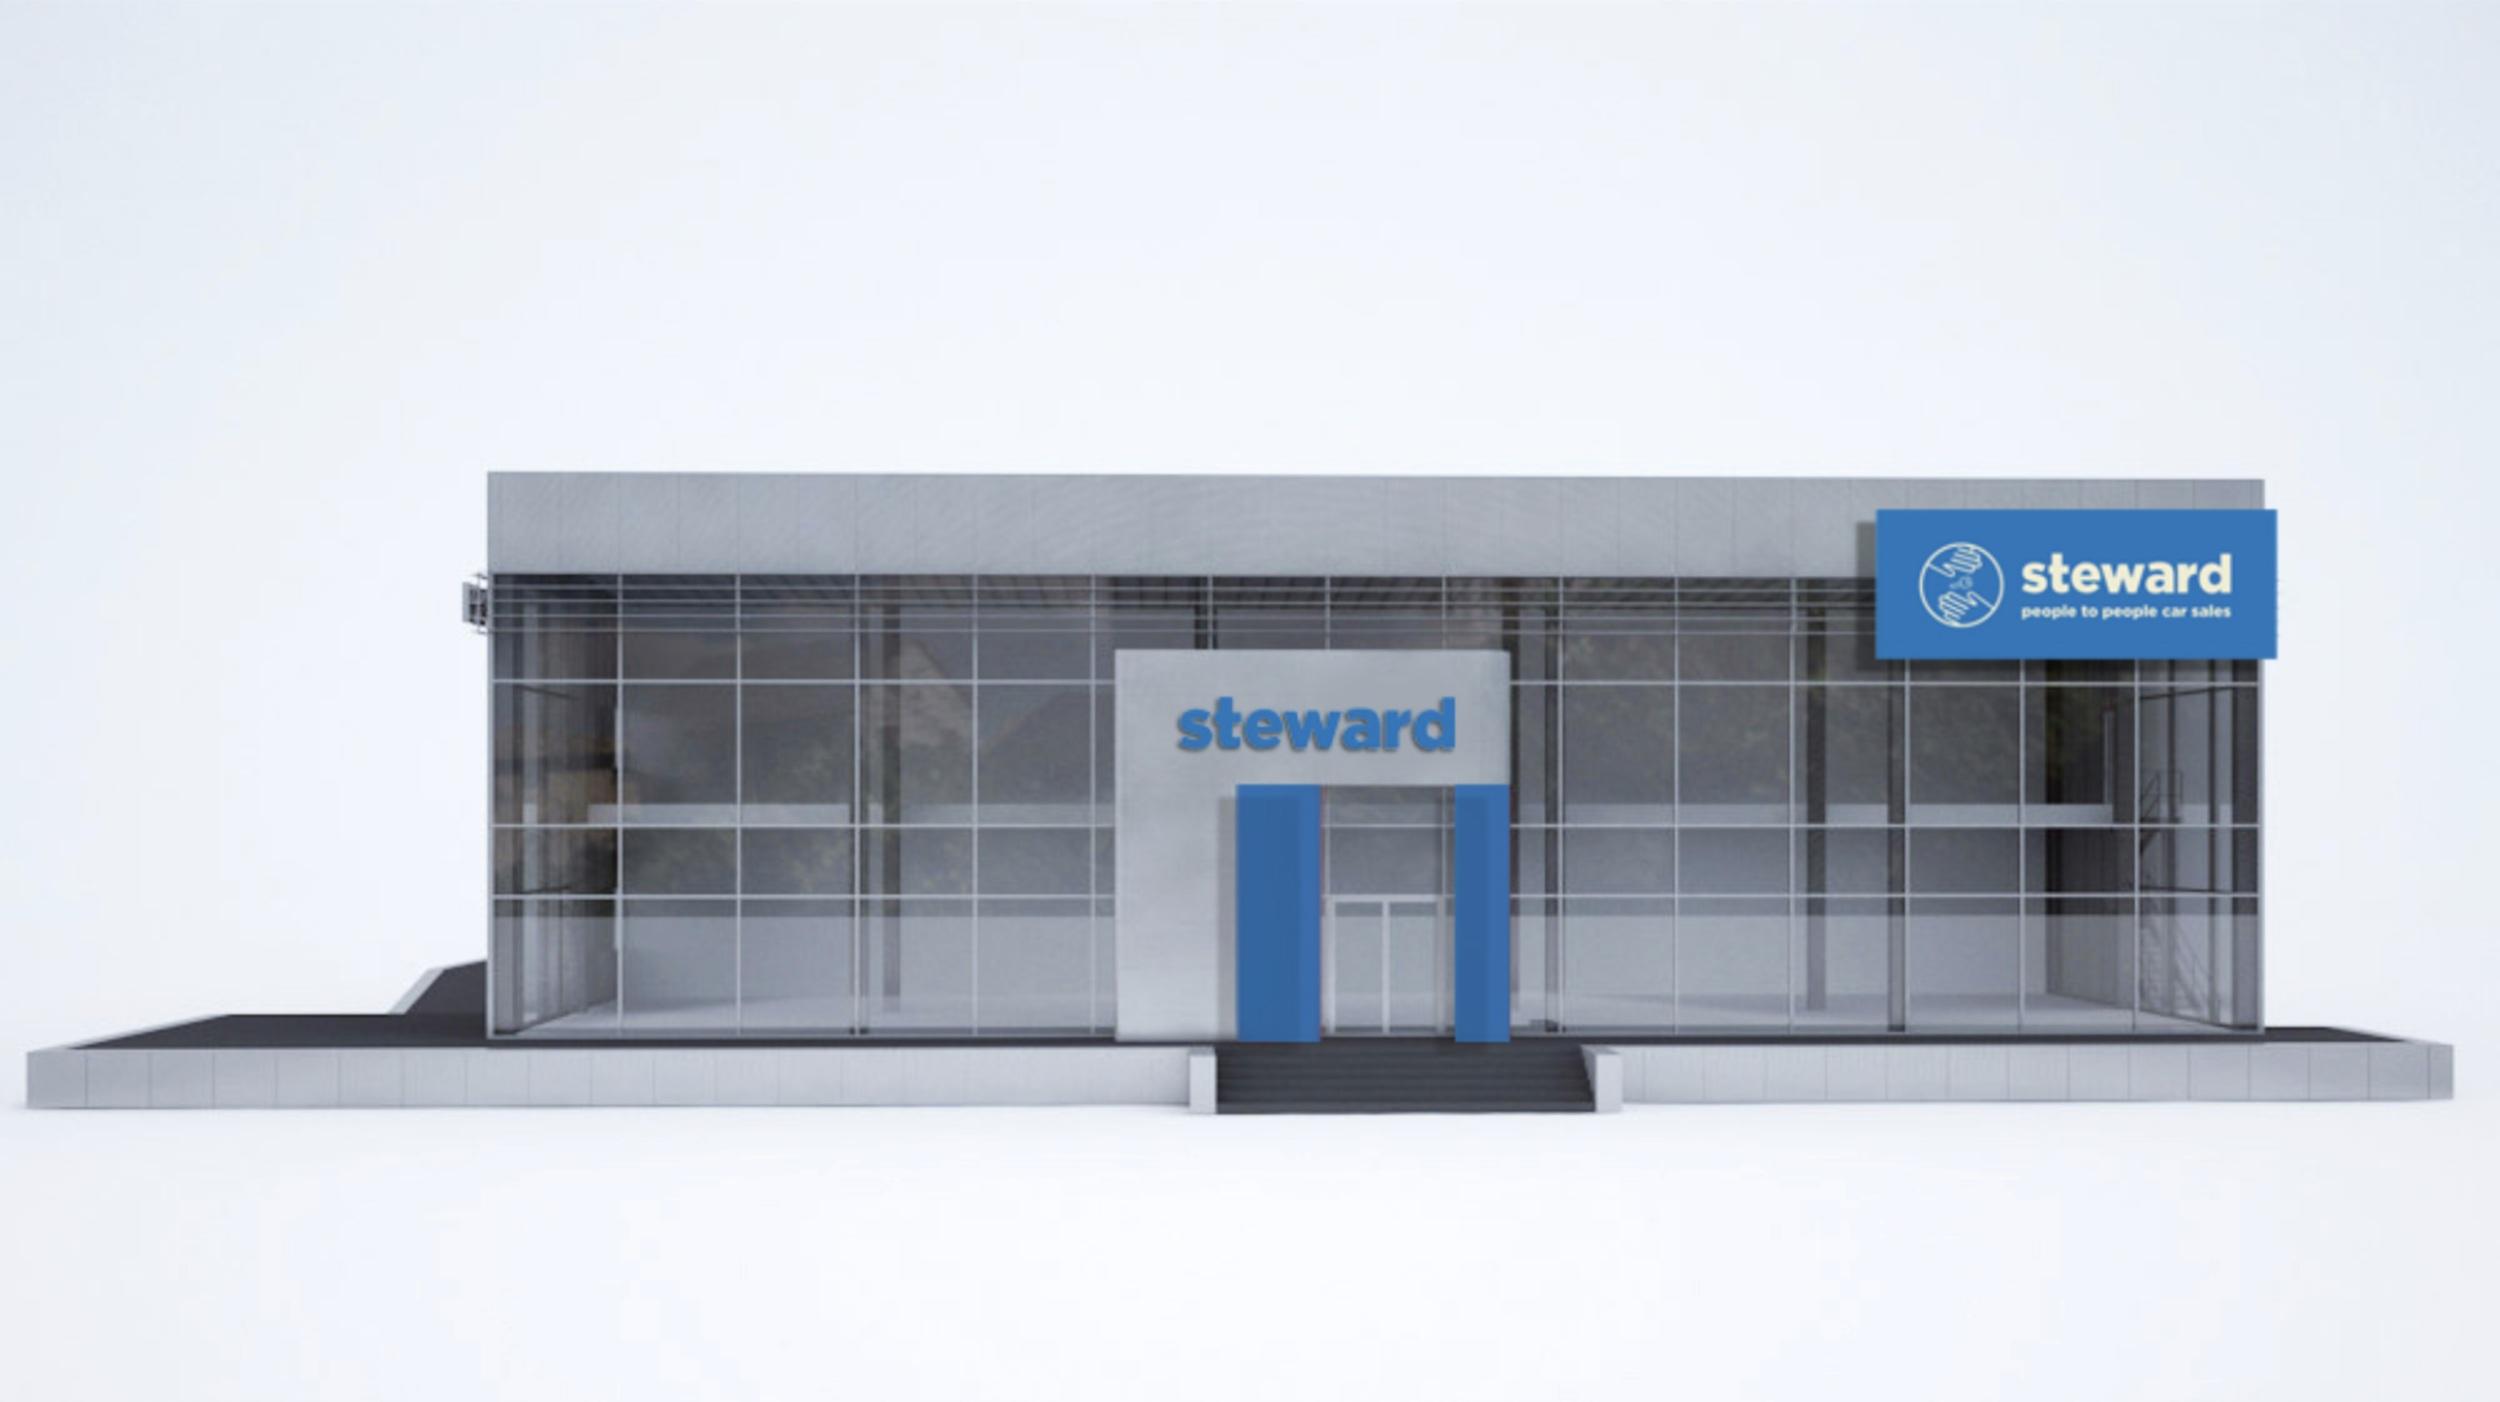 Steward dealership store front.